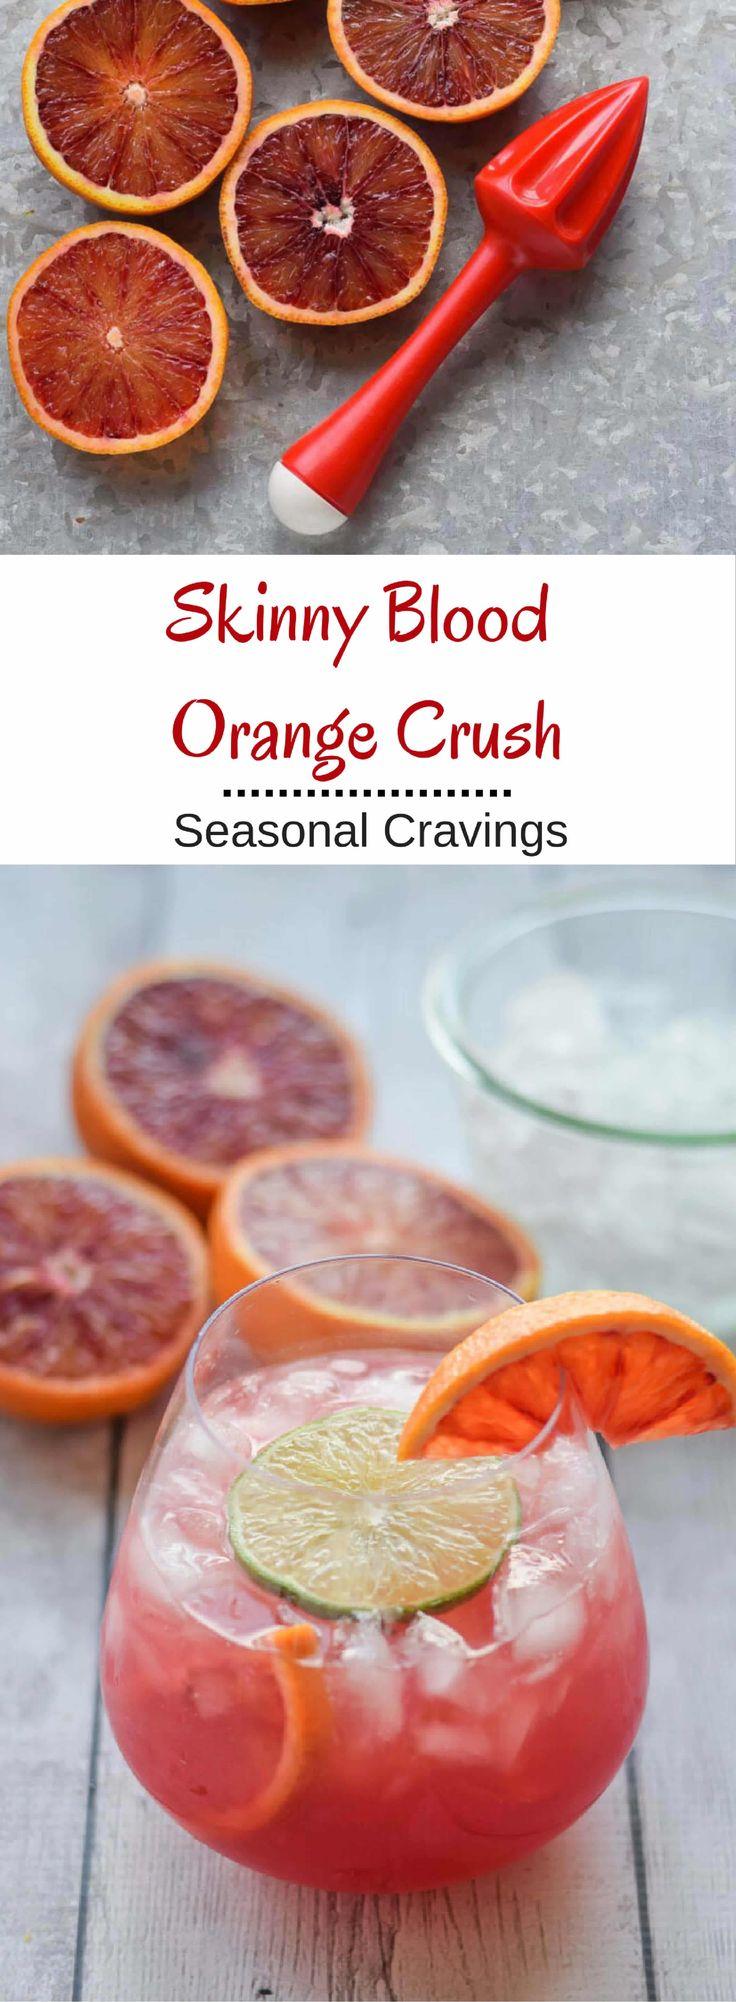 Fruit pop crush game - Skinny Blood Orange Crush